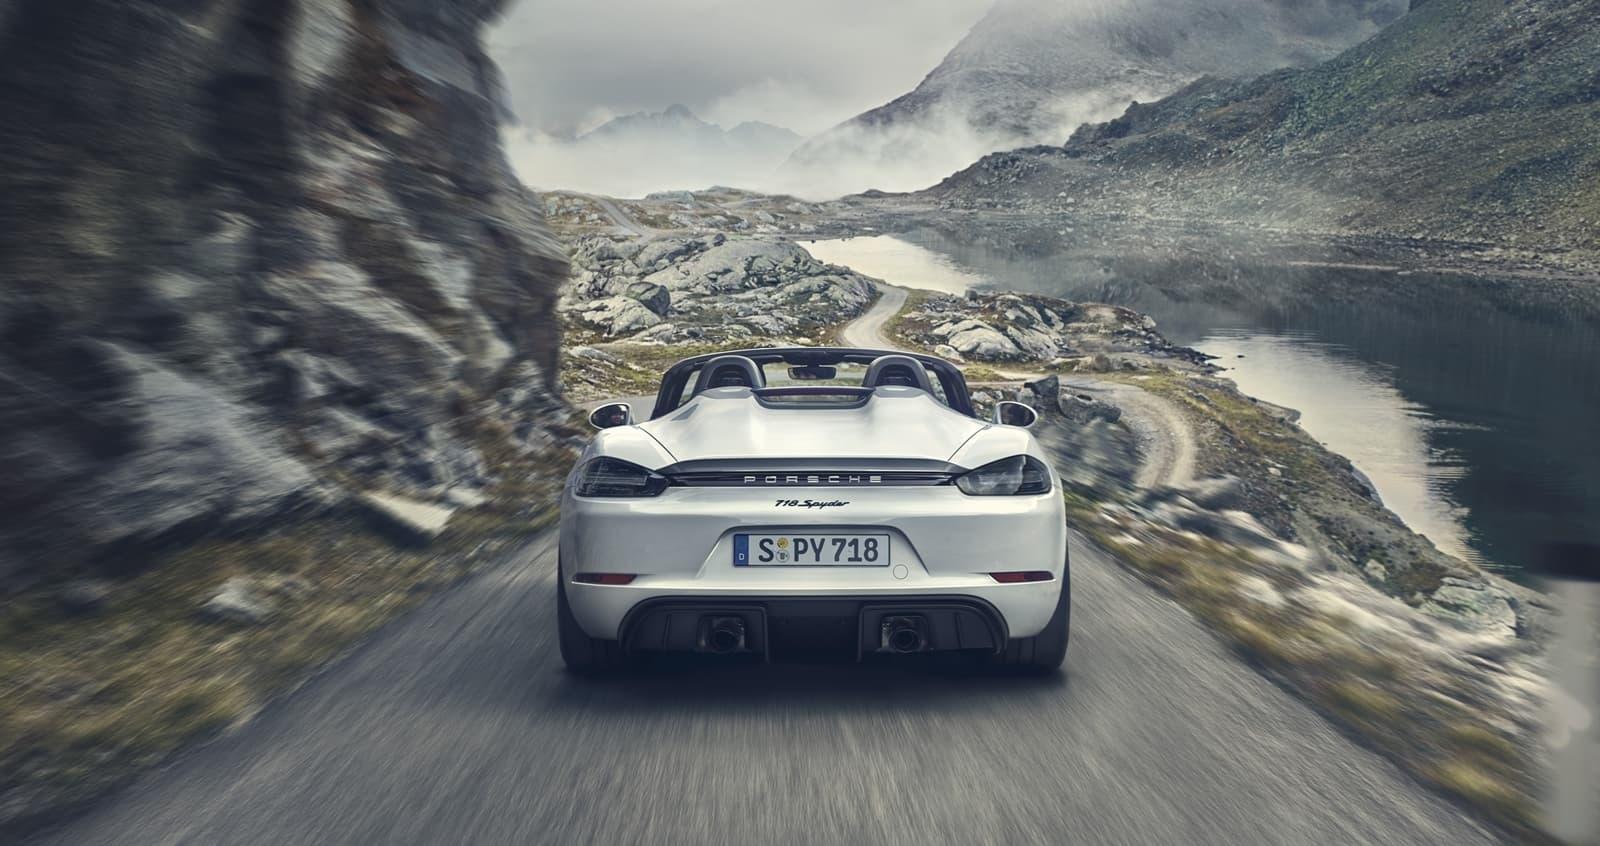 Porsche 718 Spyder 2019 0619 010